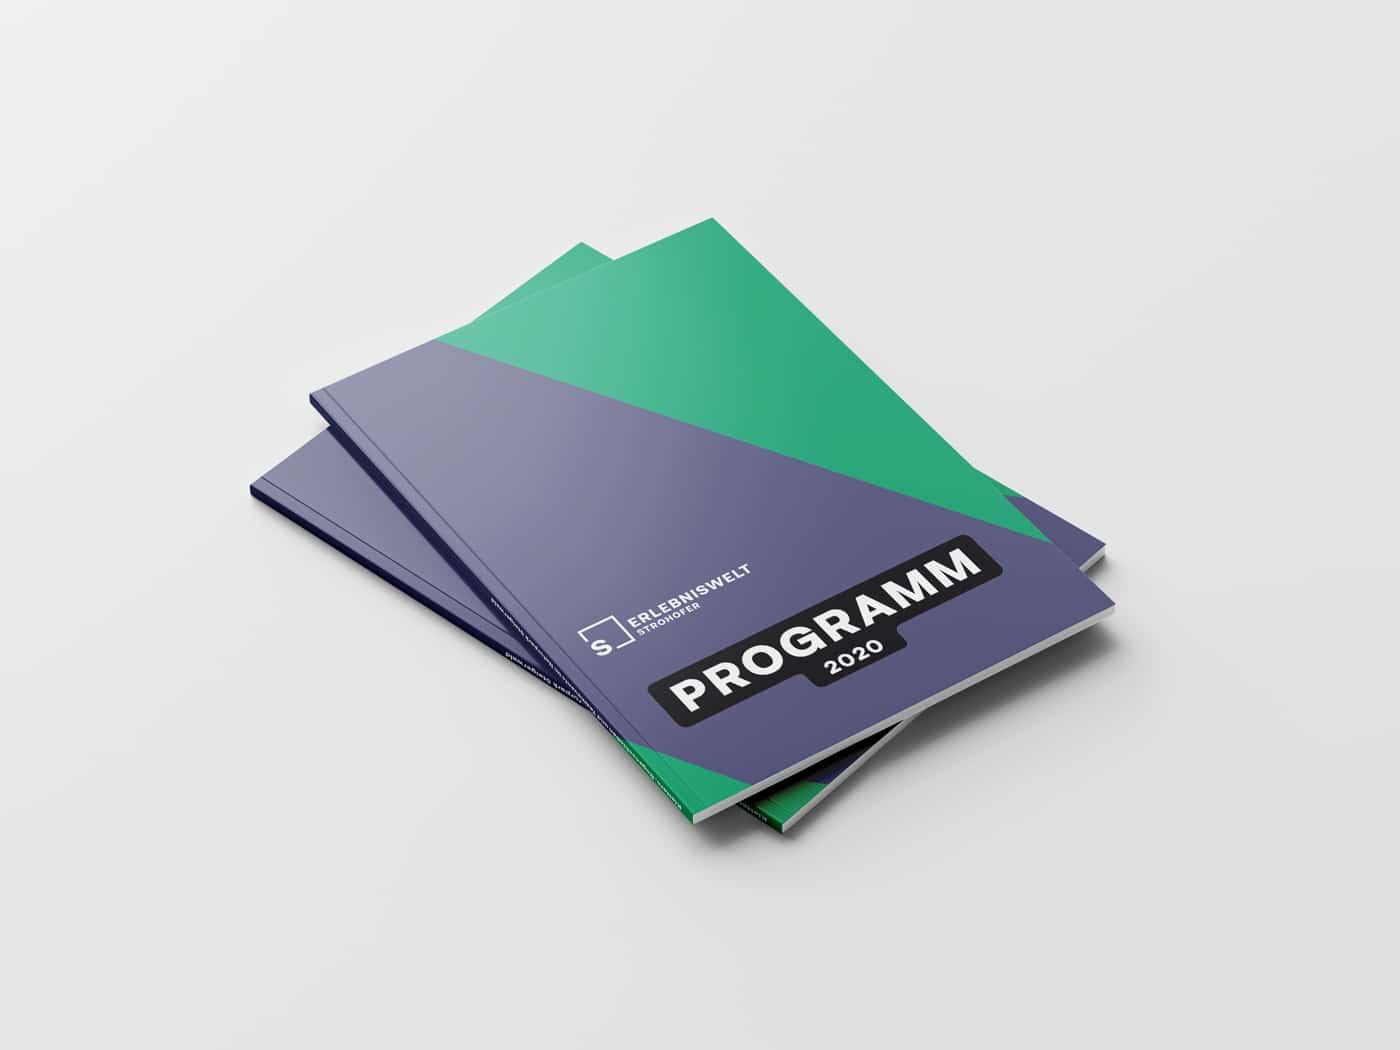 Erlebniswelt Strohofer Broschüre Titel Design